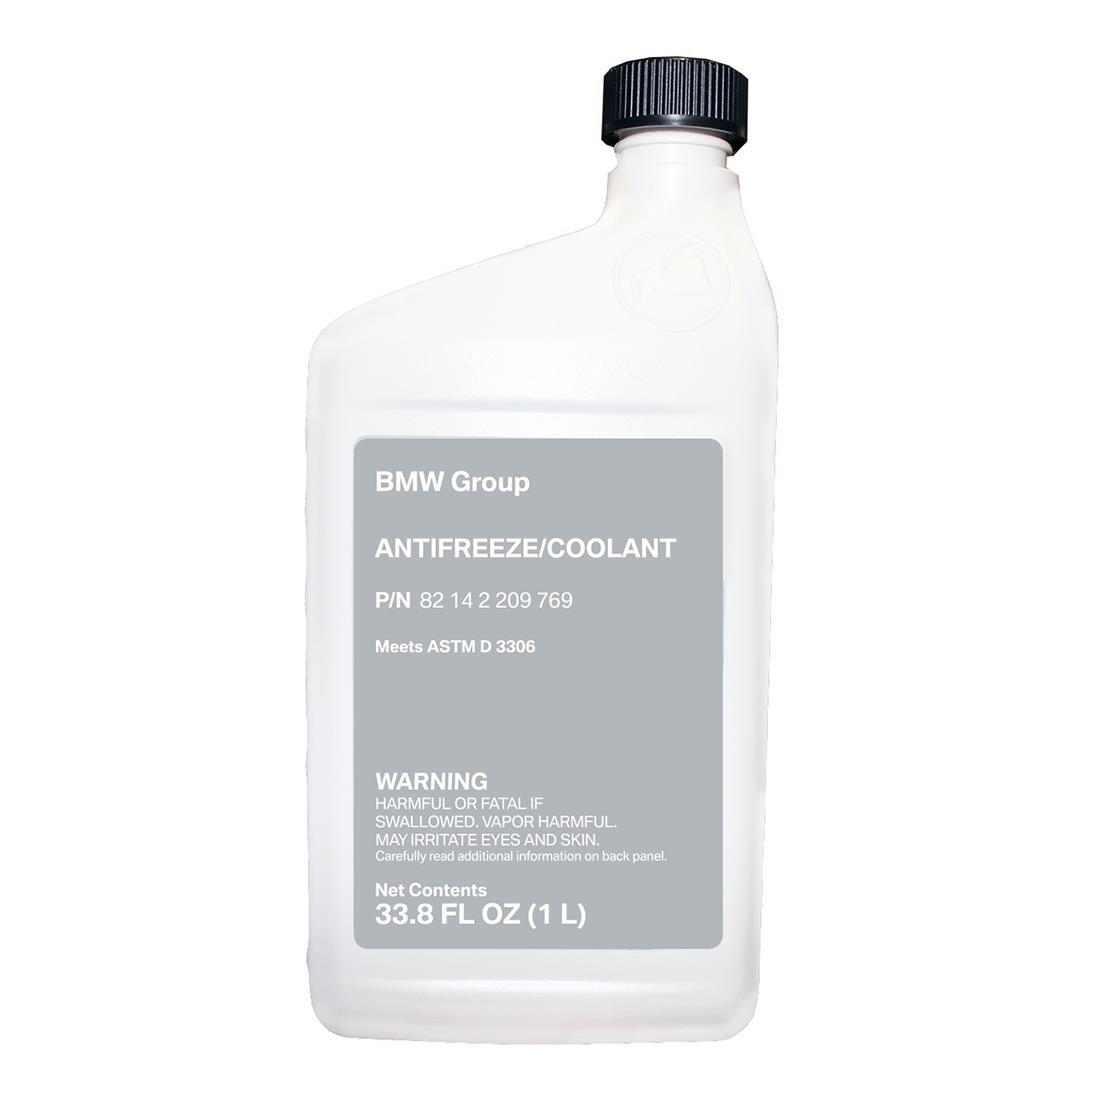 ShopBMWUSA.com: BMW ANTIFREEZE/COOLANT